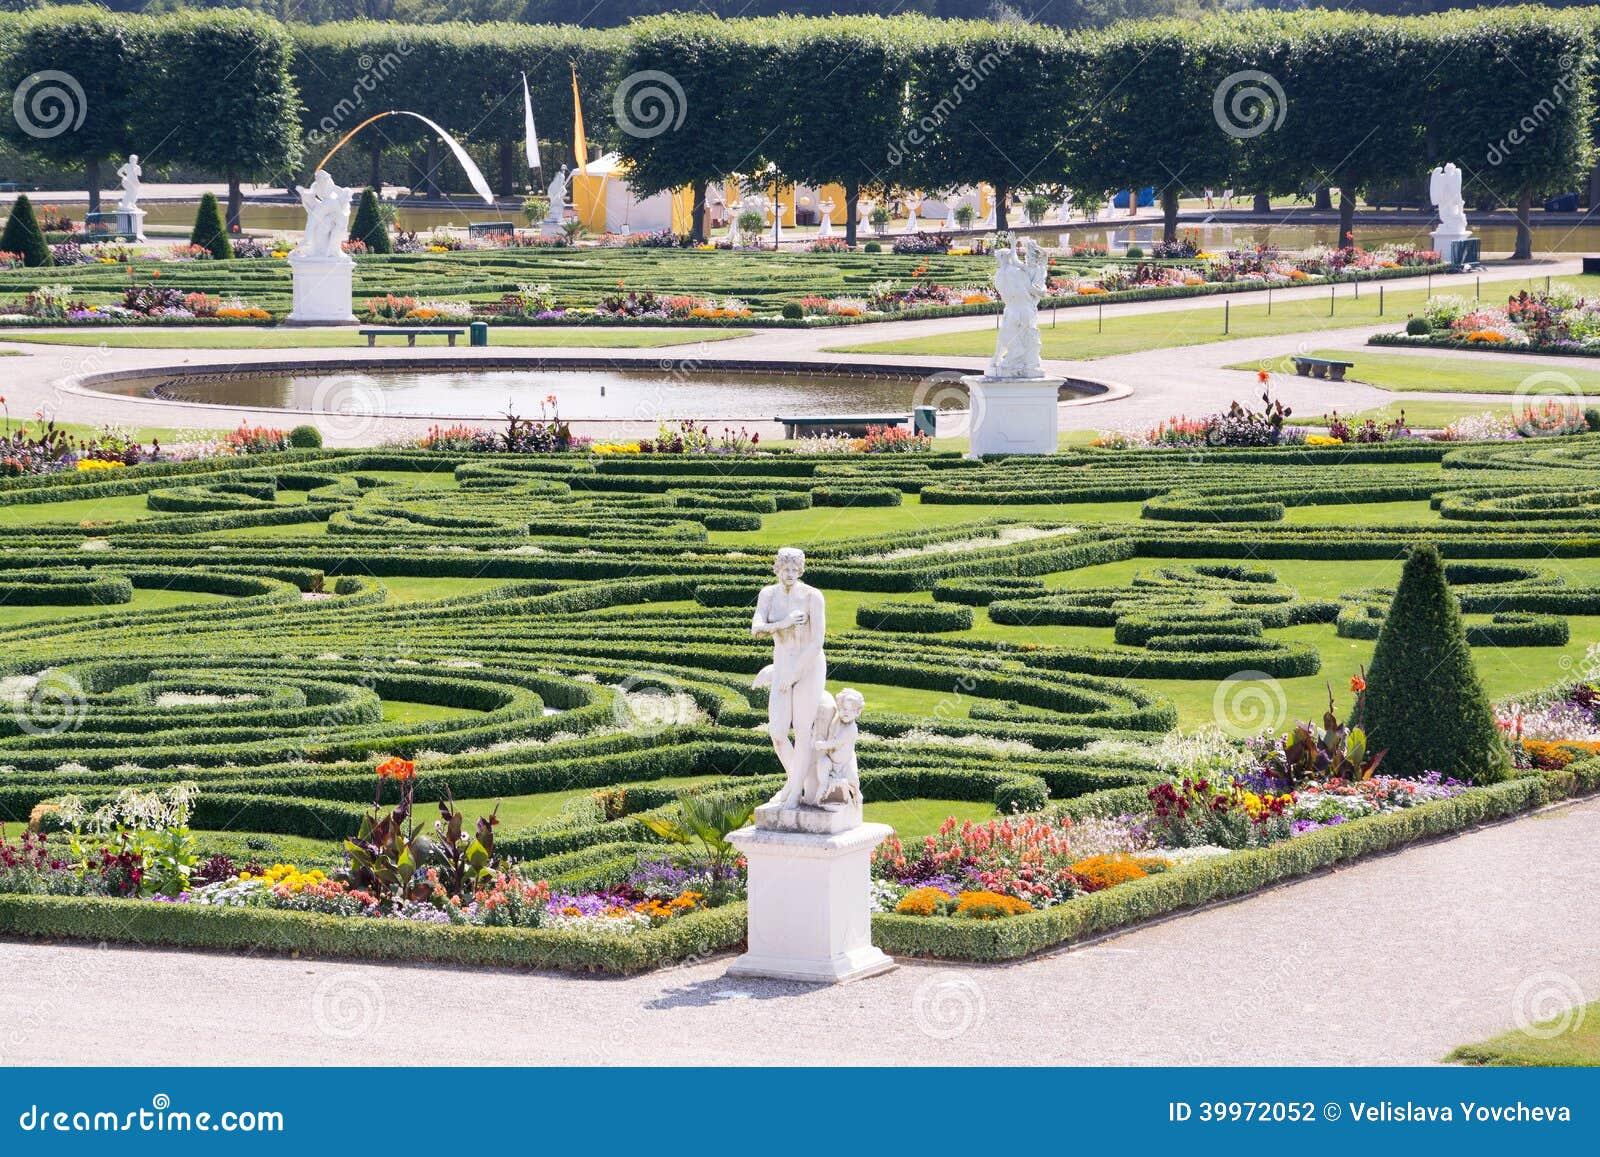 Grandes jardines herrenhausen hannover baja sajonia - Fotos de jardines ...